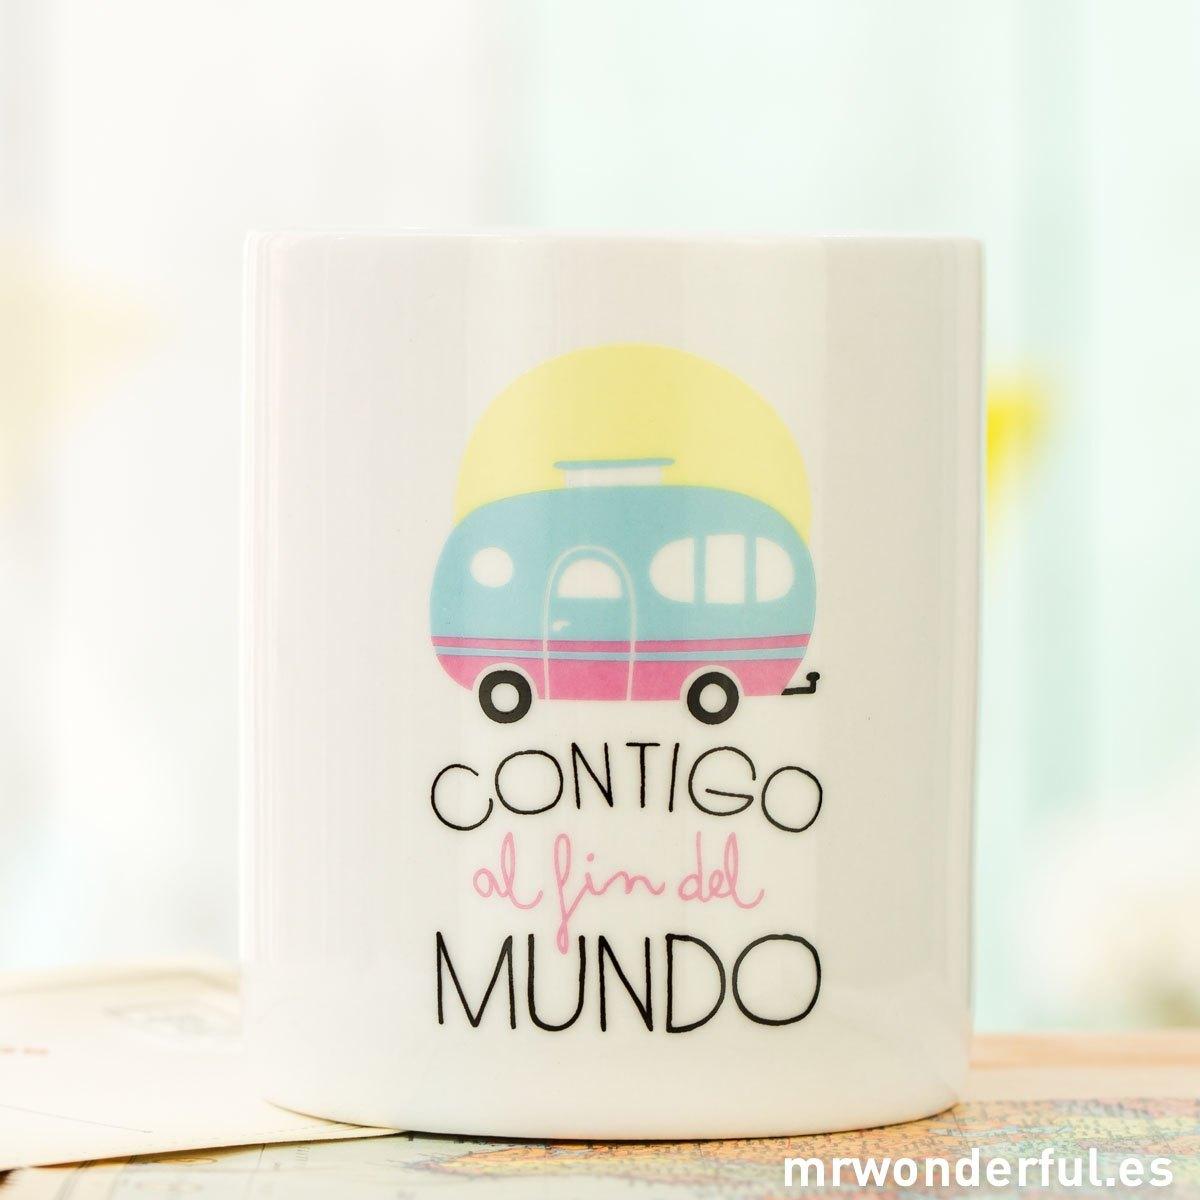 mrwonderful_won96_contigo-fin-mundo-6-2